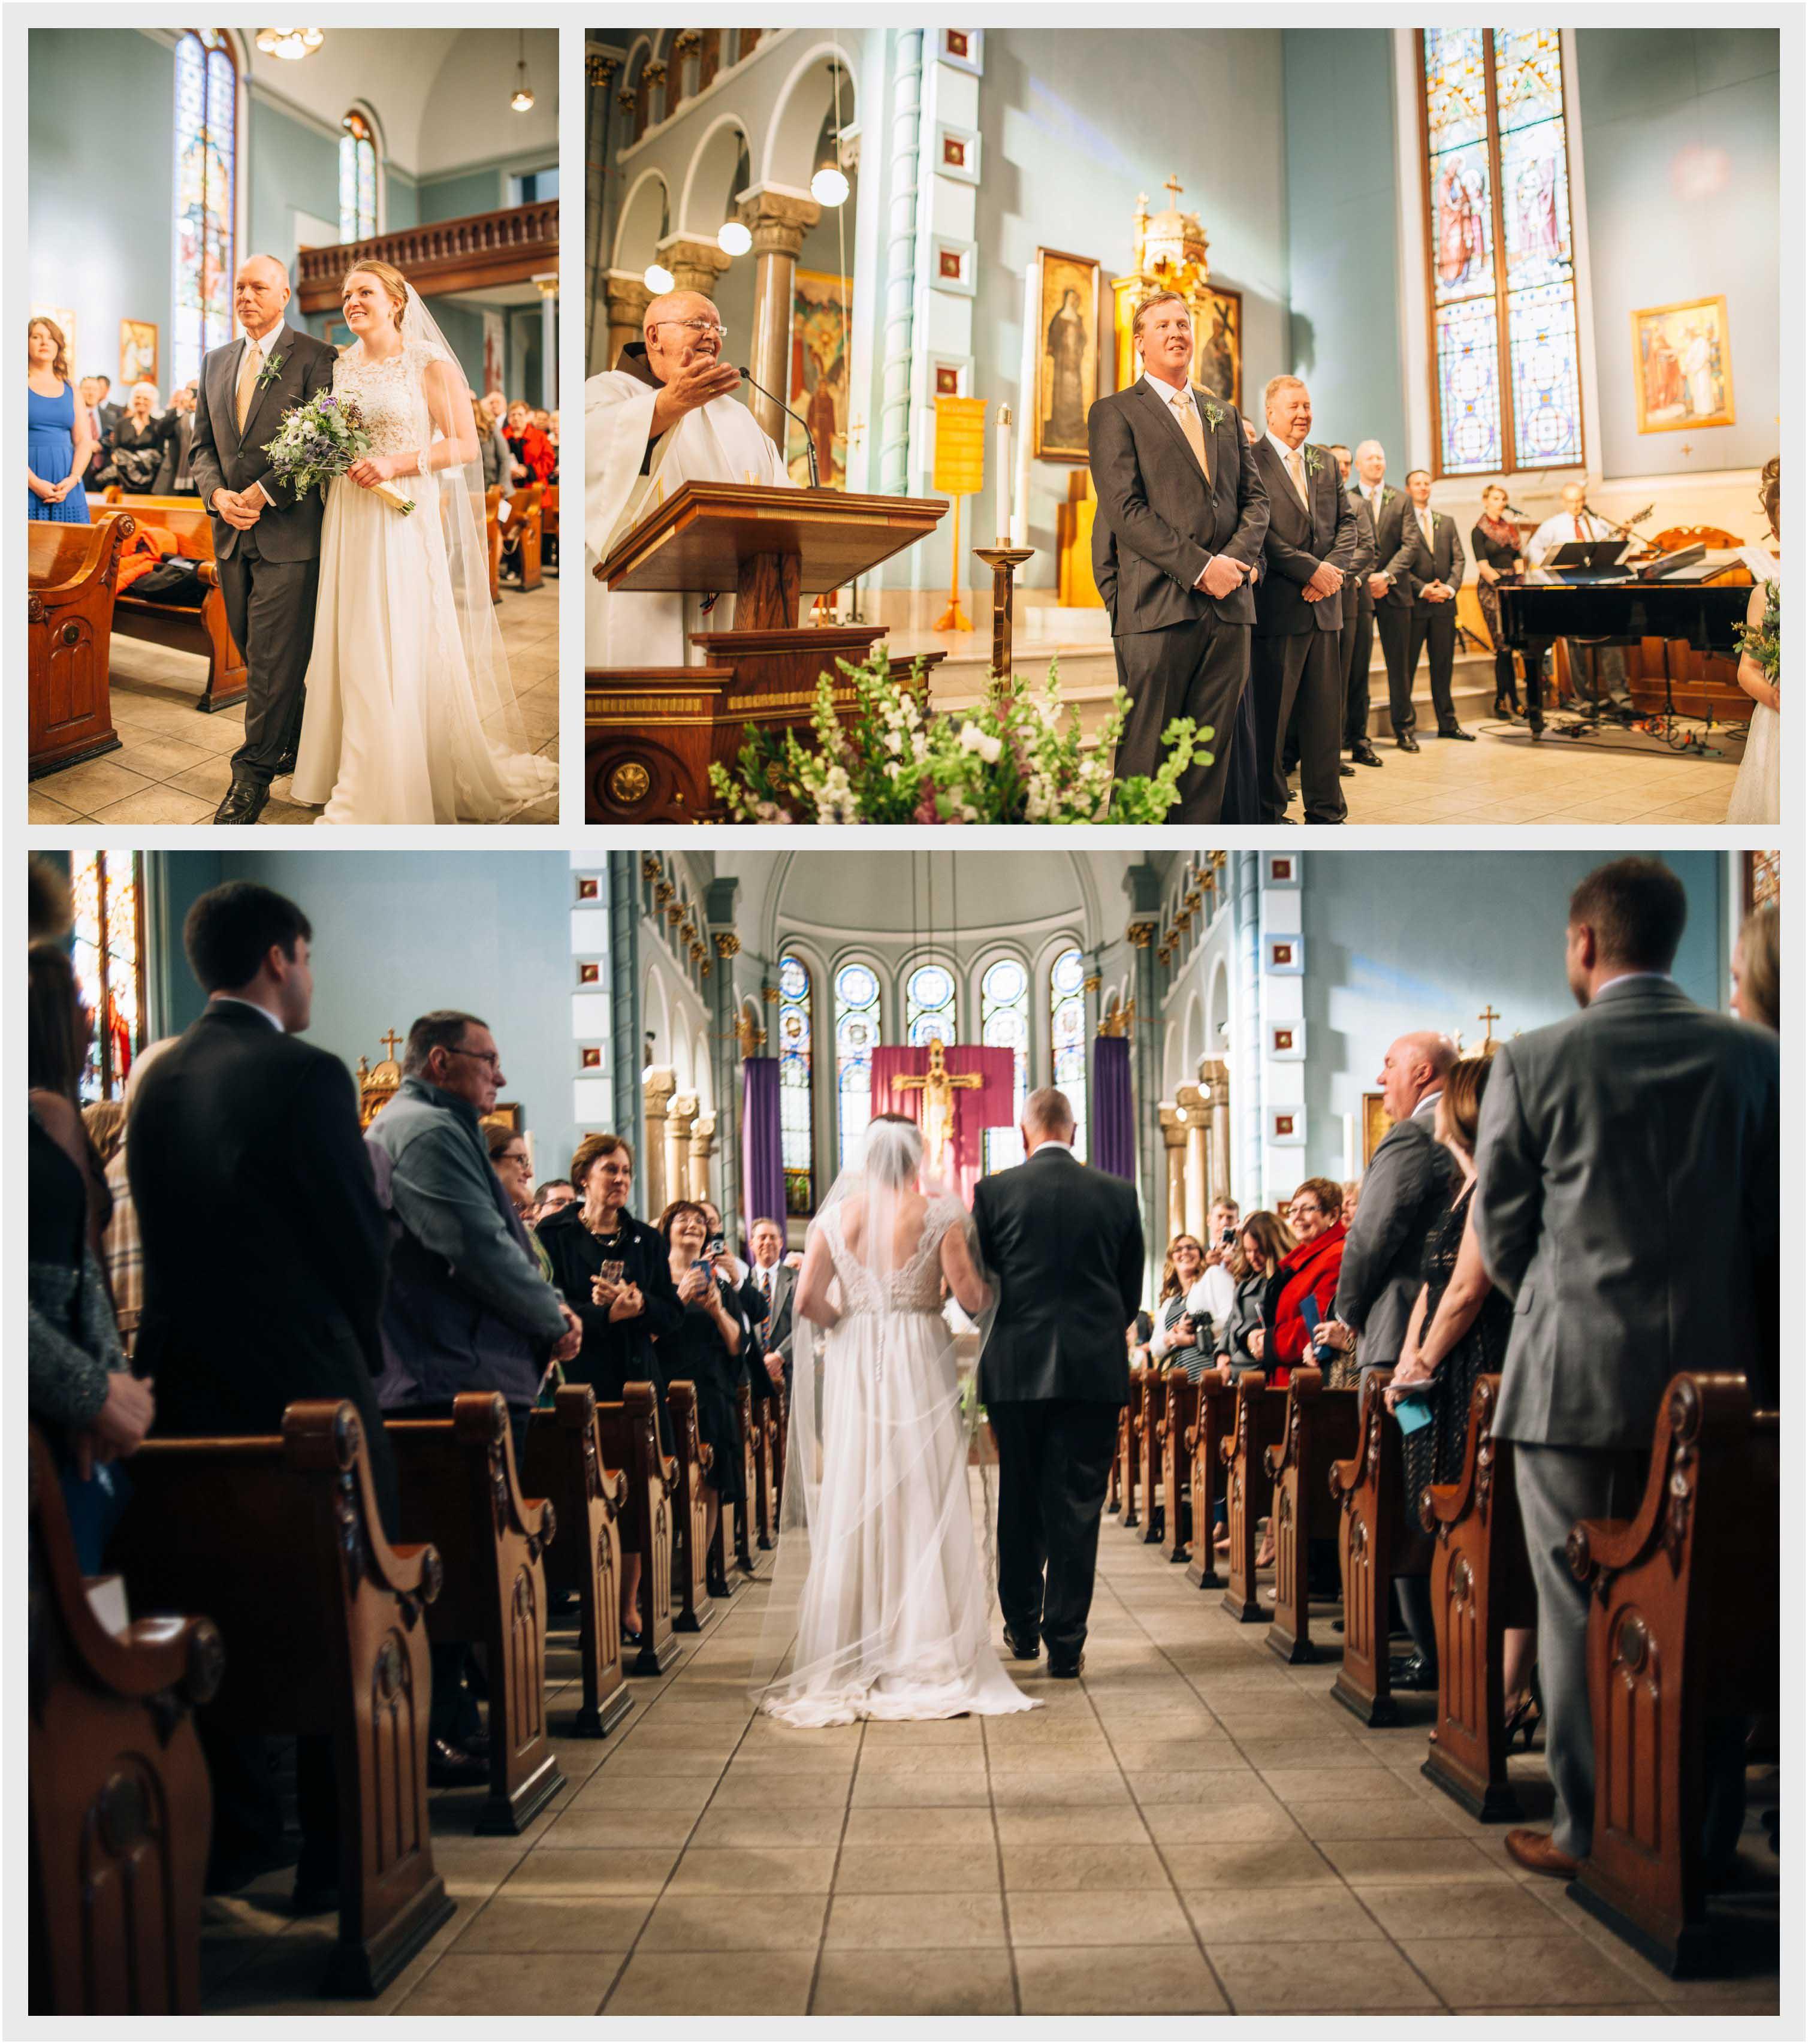 Rhinegeist wedding photos 19